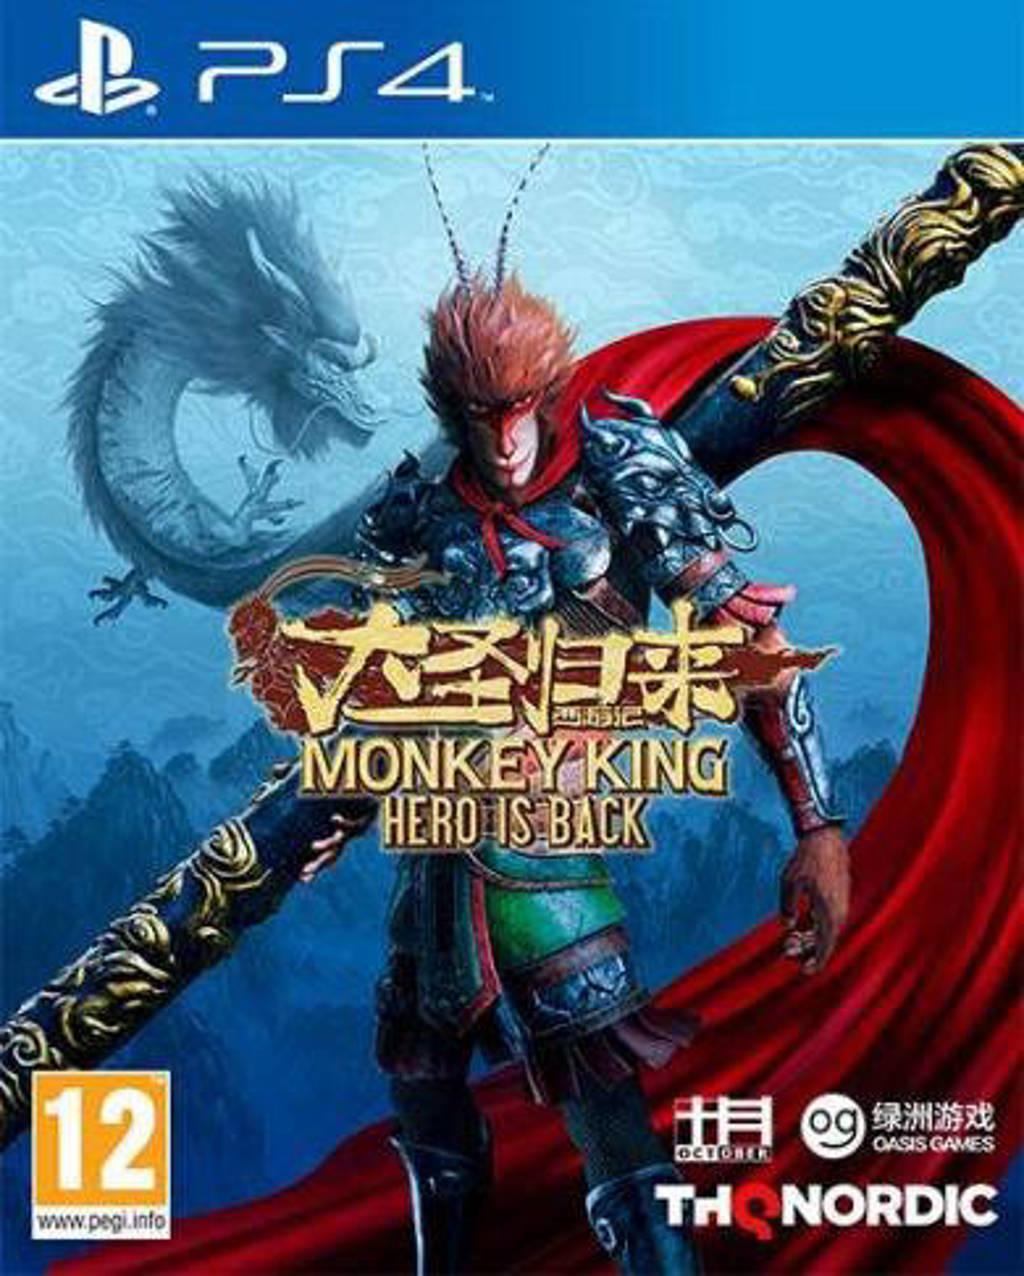 Monkey King - Hero is Back (PlayStation 4)